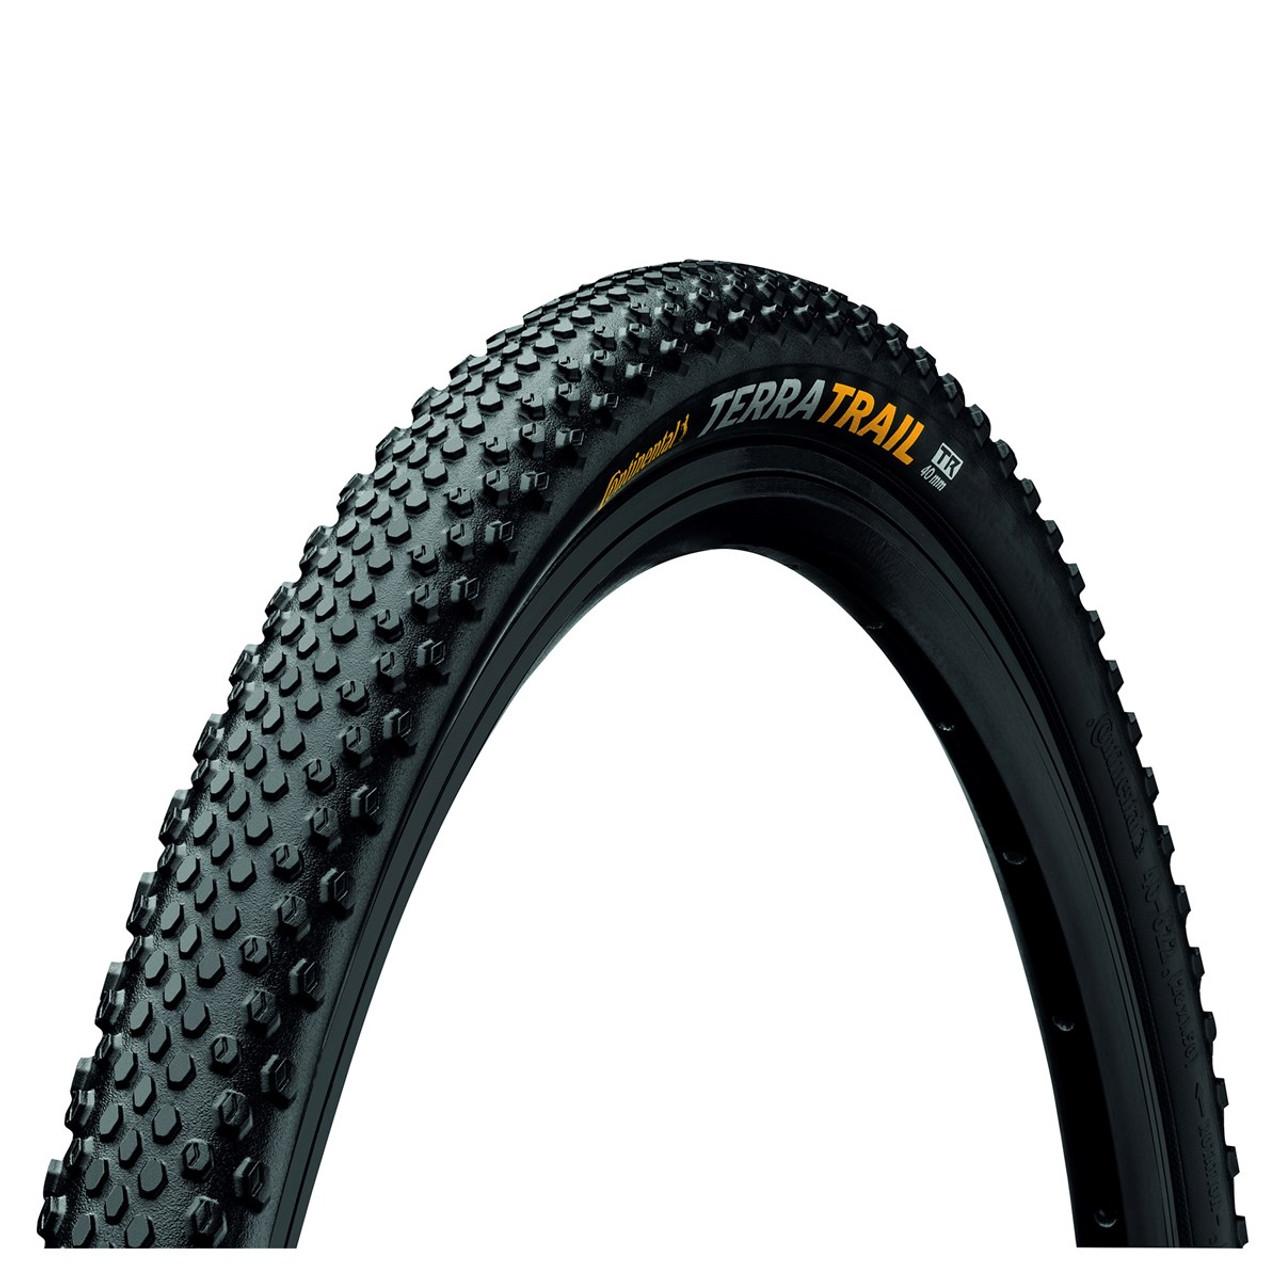 Continenal Terra Trail Shieldwall PureGrip Folding Gravel Tubeless Tyre